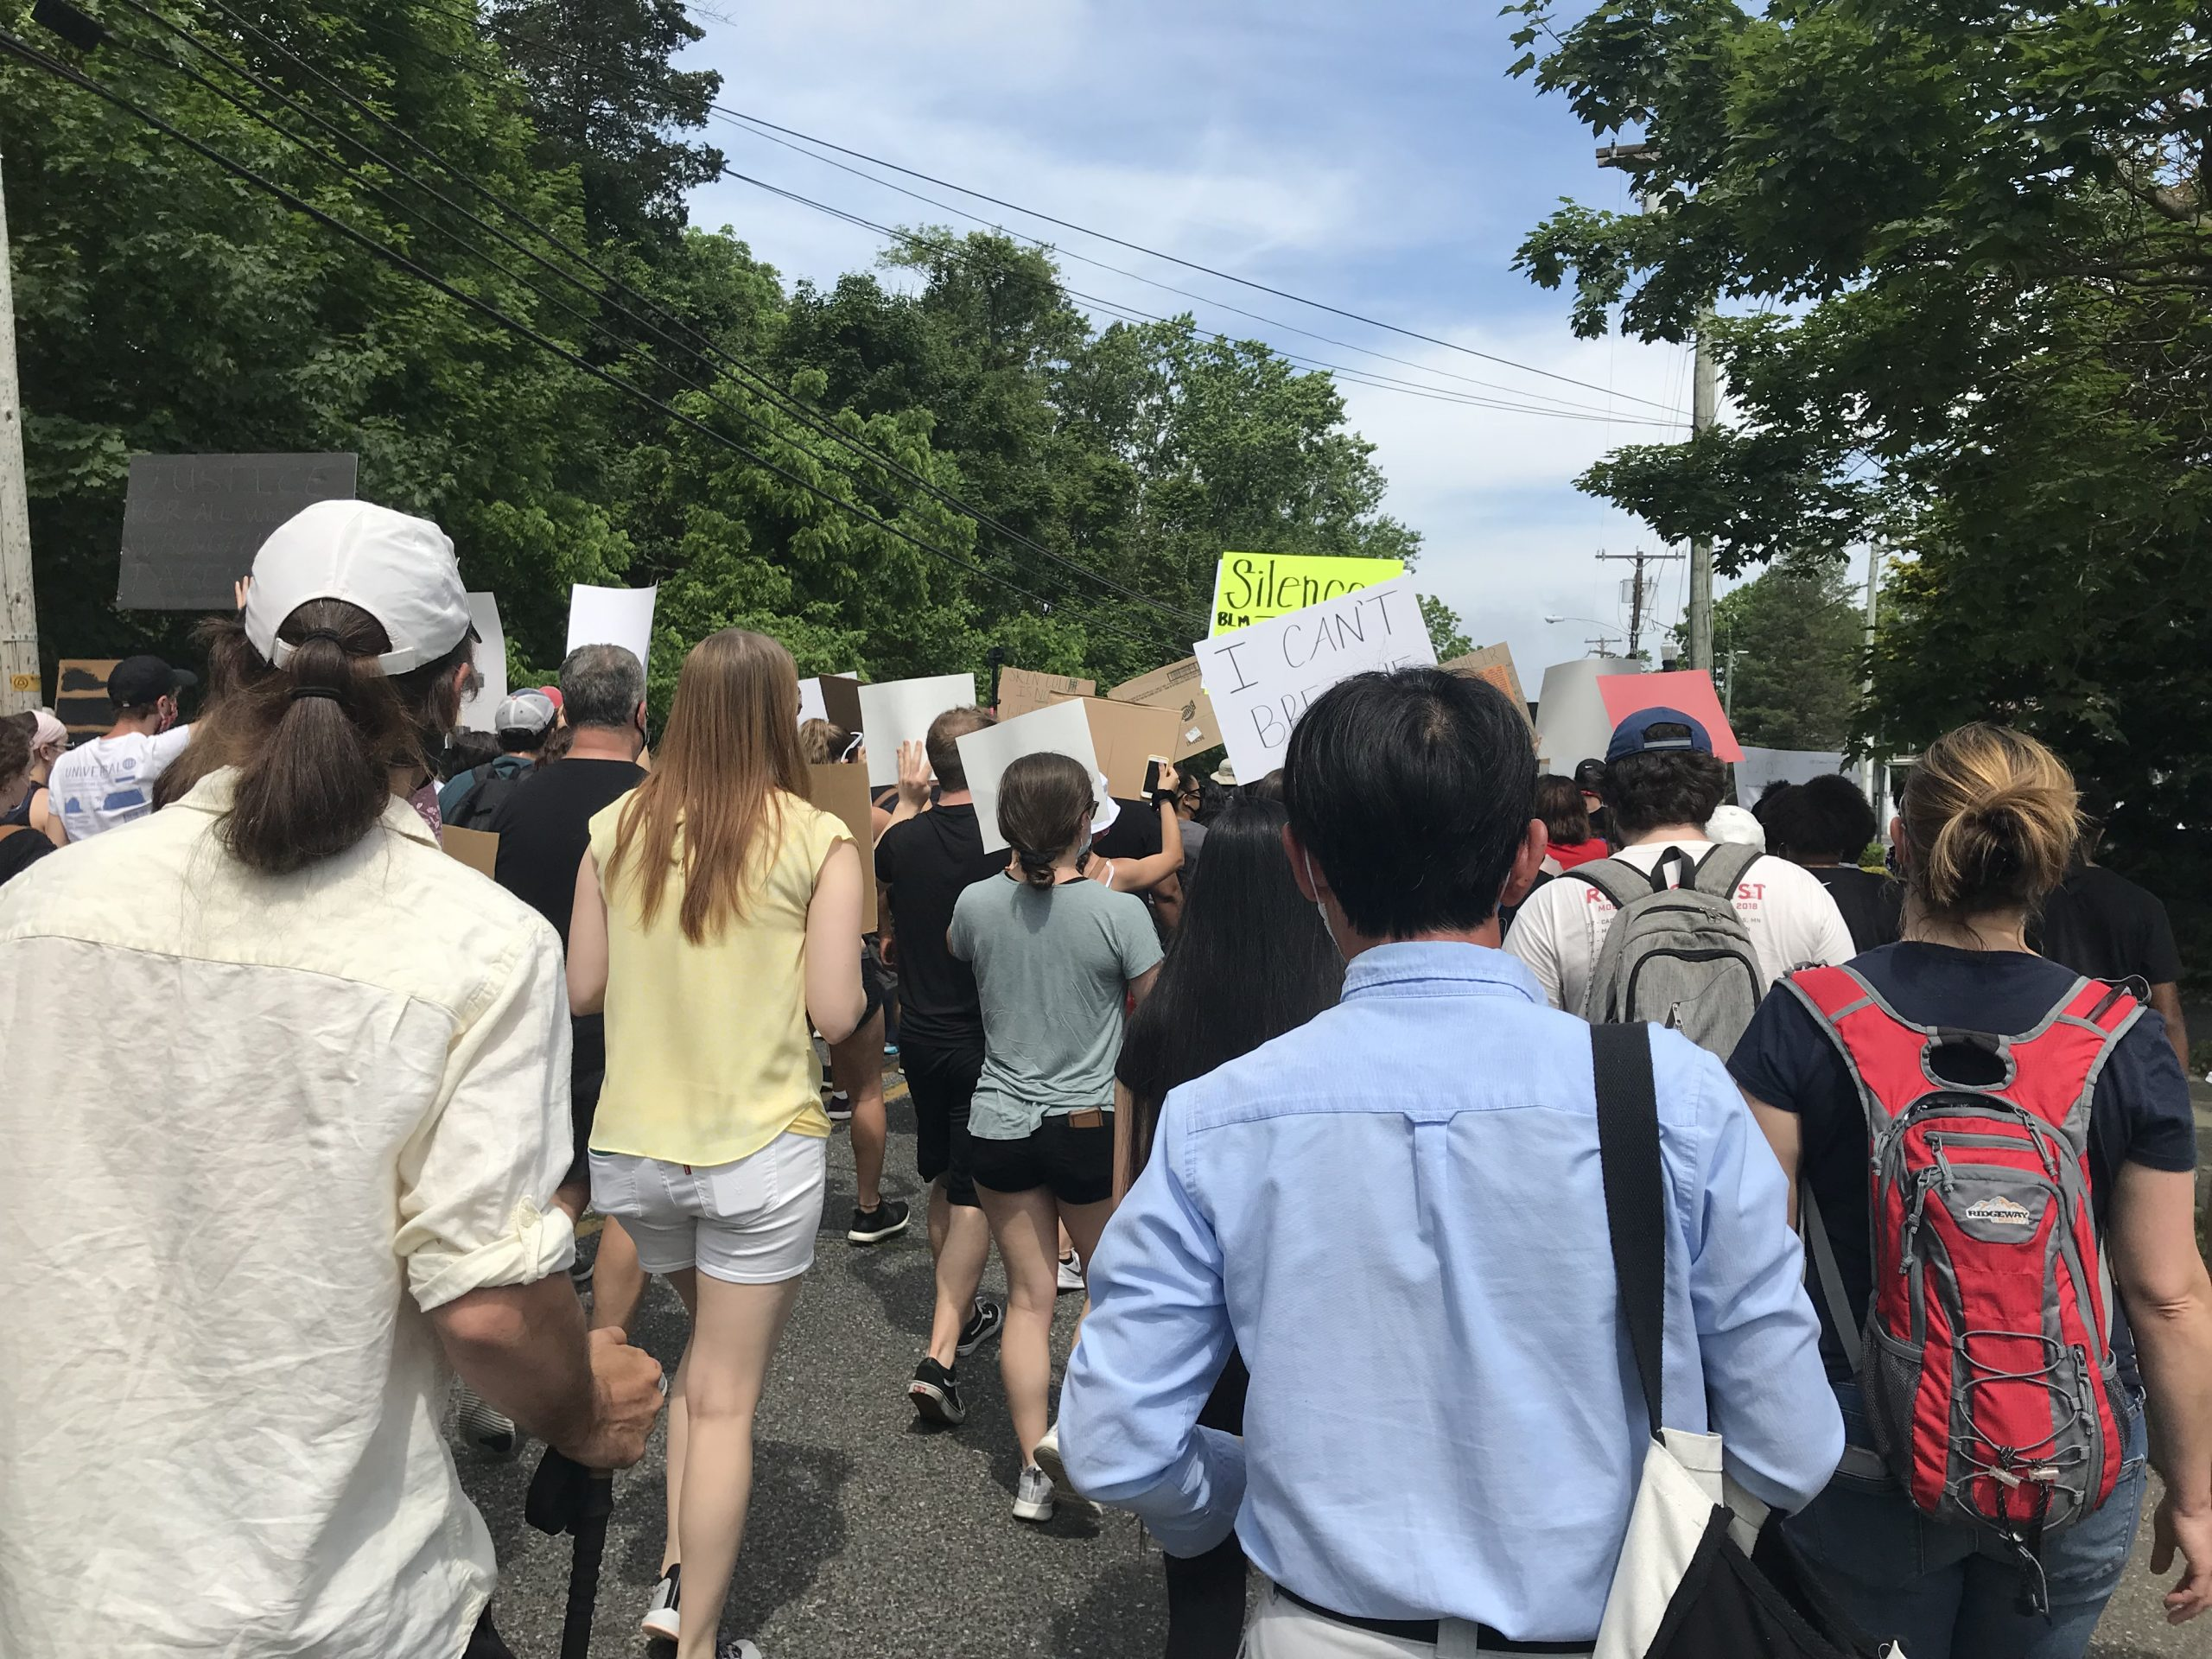 Black Lives Matter protest, Williamstown, NJ 6/6/20